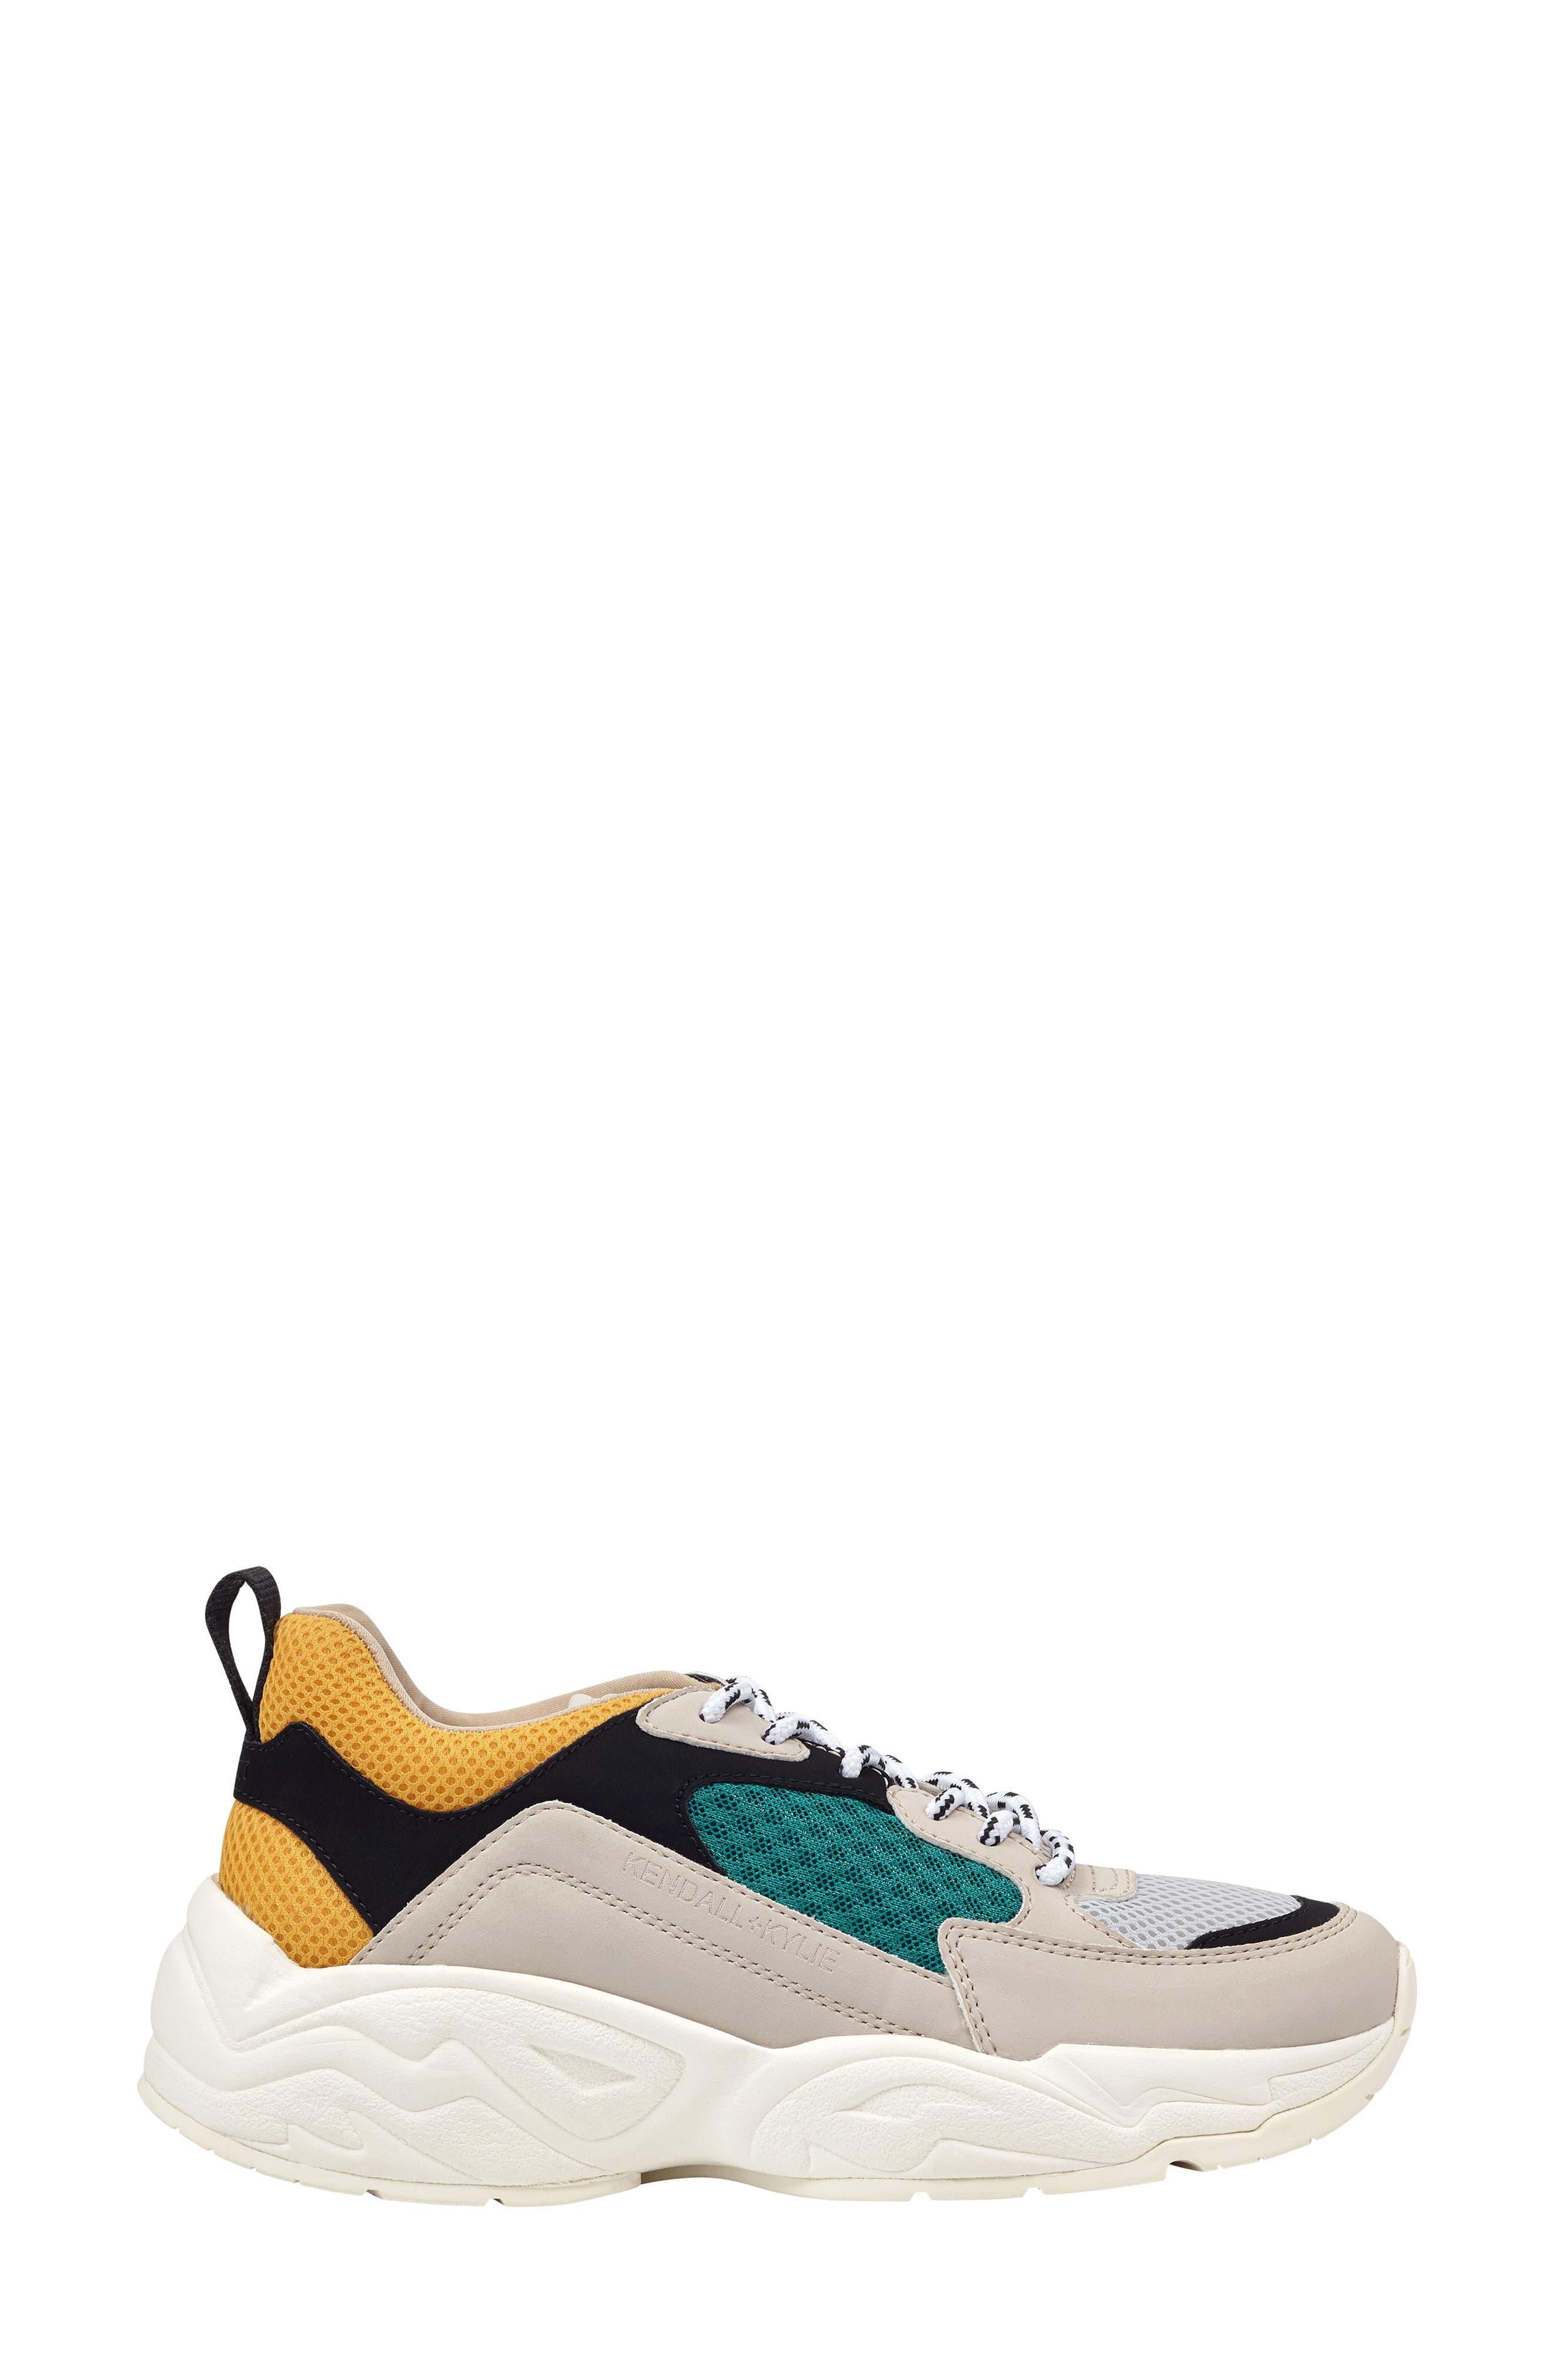 KENDALL + KYLIE,                             Dad Sneaker,                             Alternate thumbnail 3, color,                             250